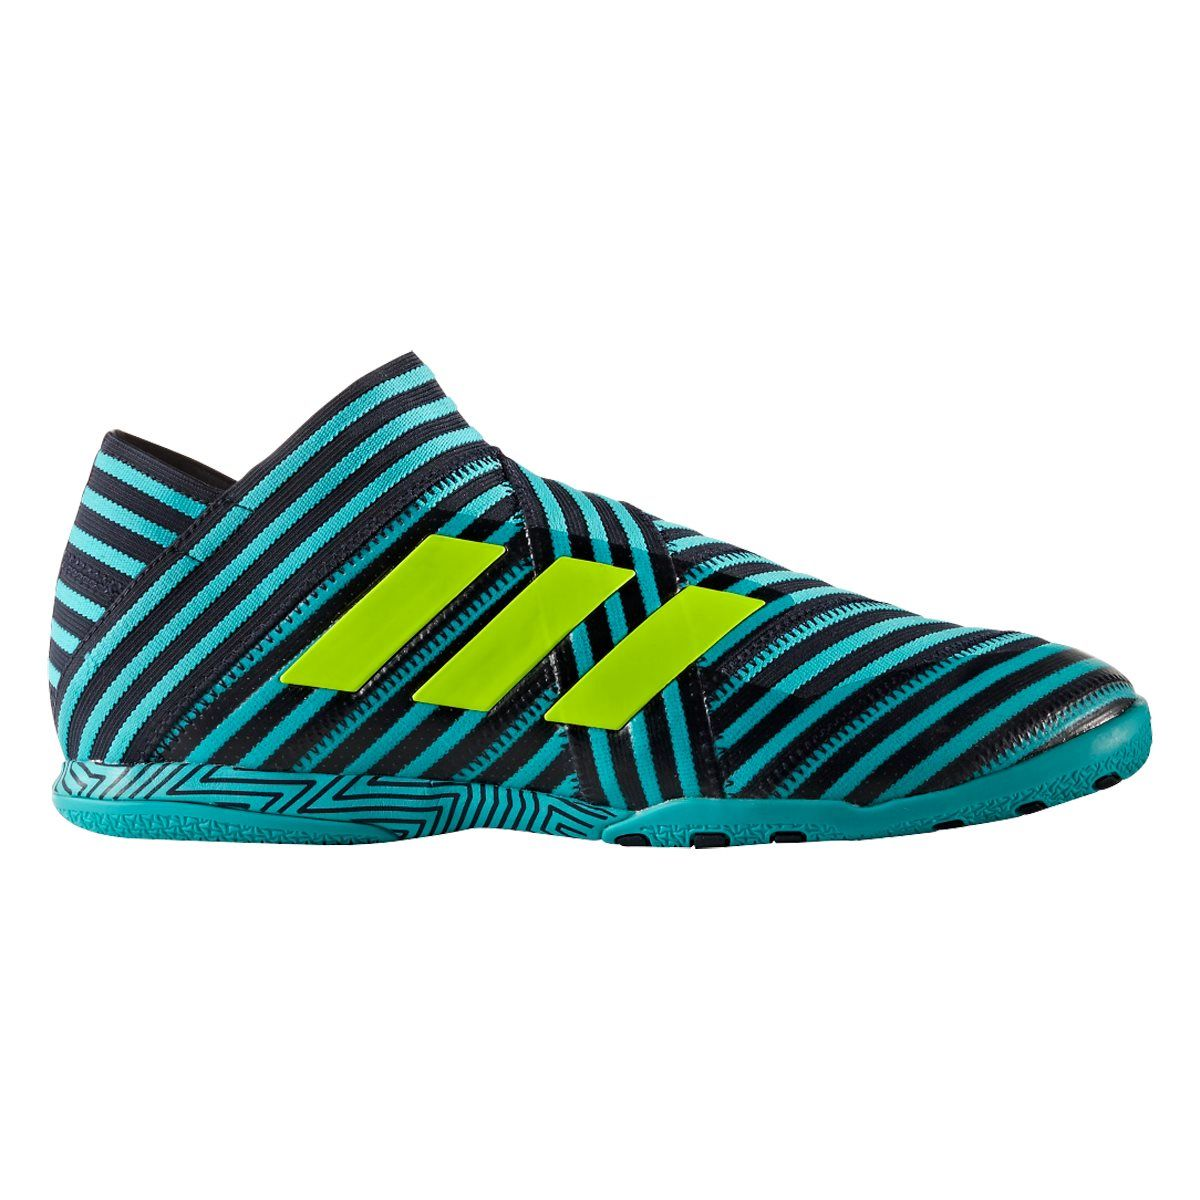 save off 7ab17 e7f76 adidas Ocean Storm   adidas Nemeziz Tango 17+ 360Agility Indoor Soccer Shoes